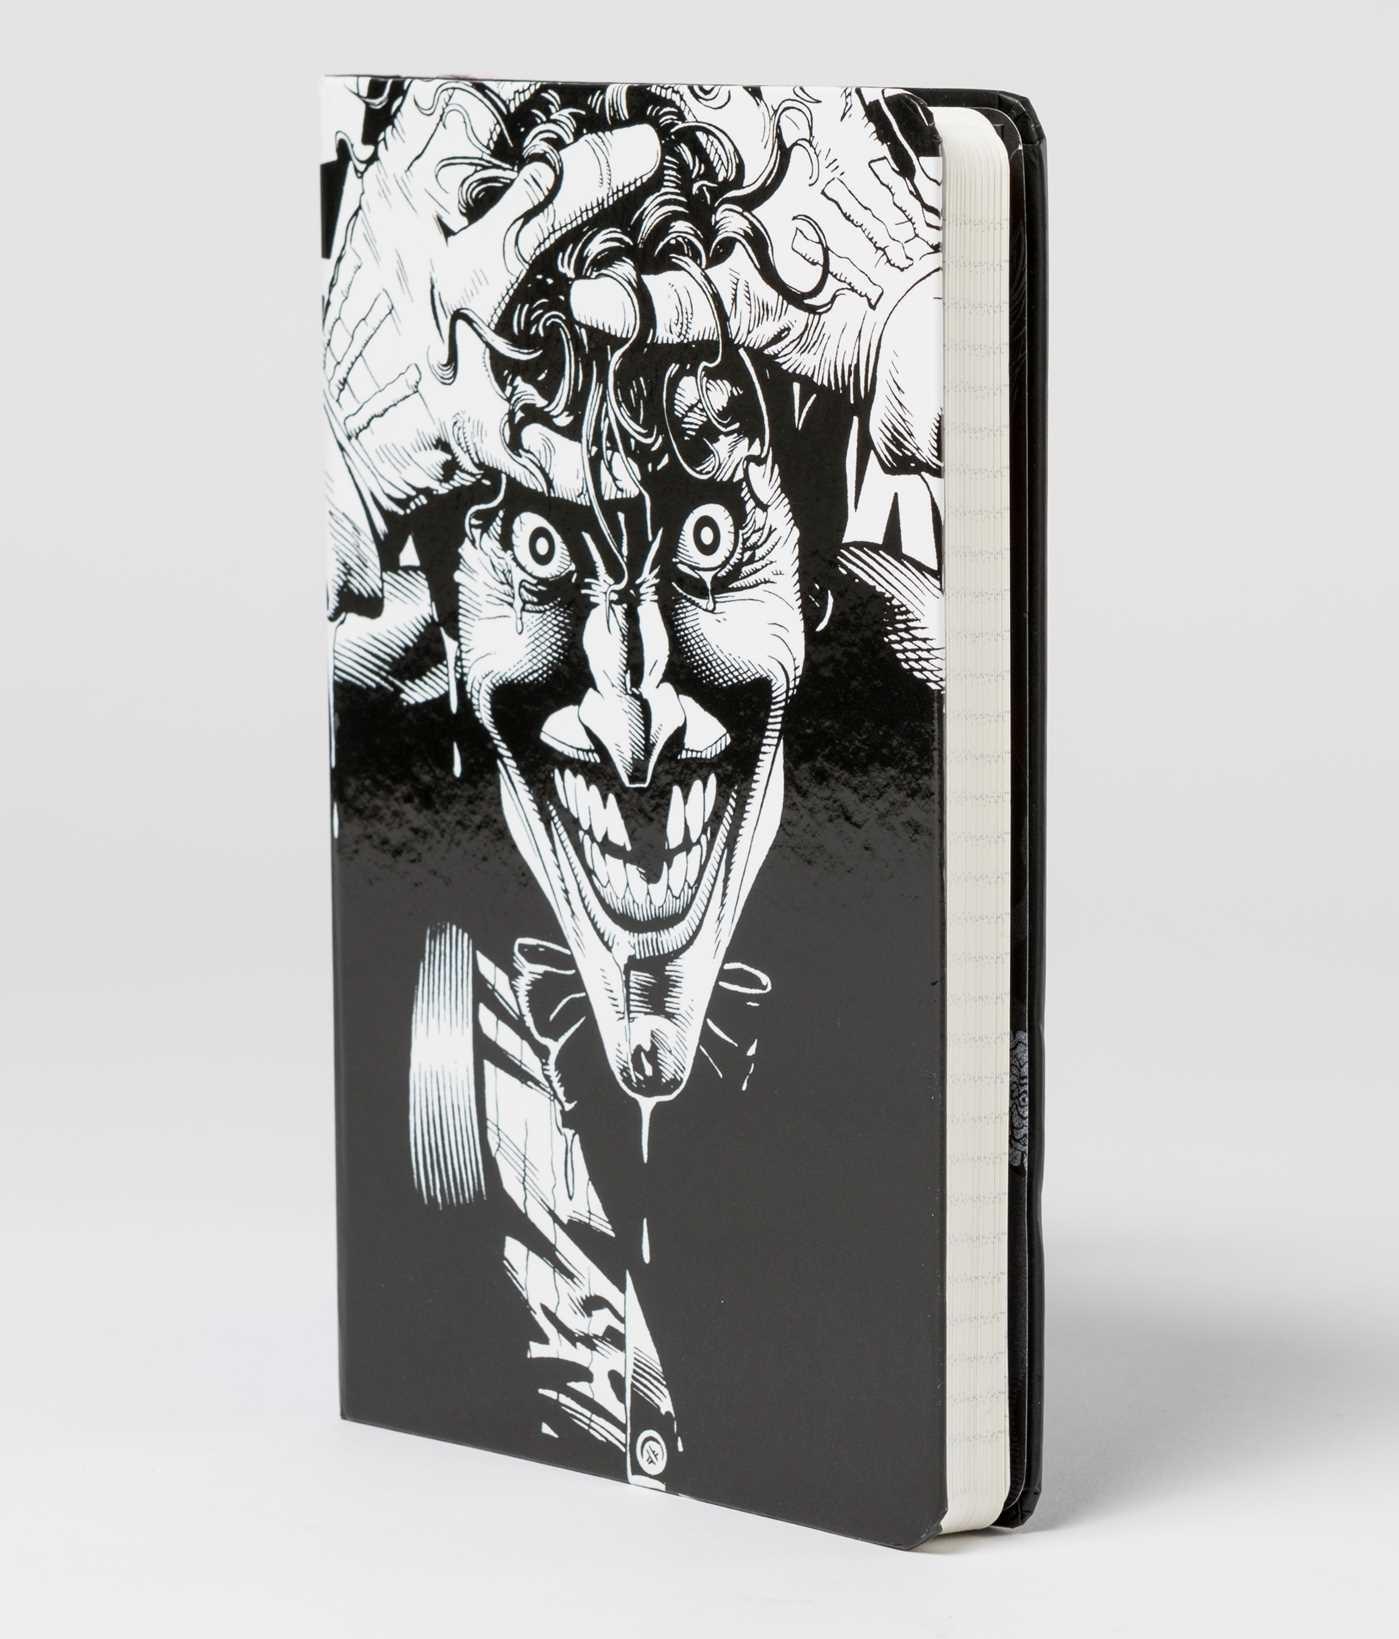 Dc comics the joker hardcover ruled journal artist edition 9781683833307.in05